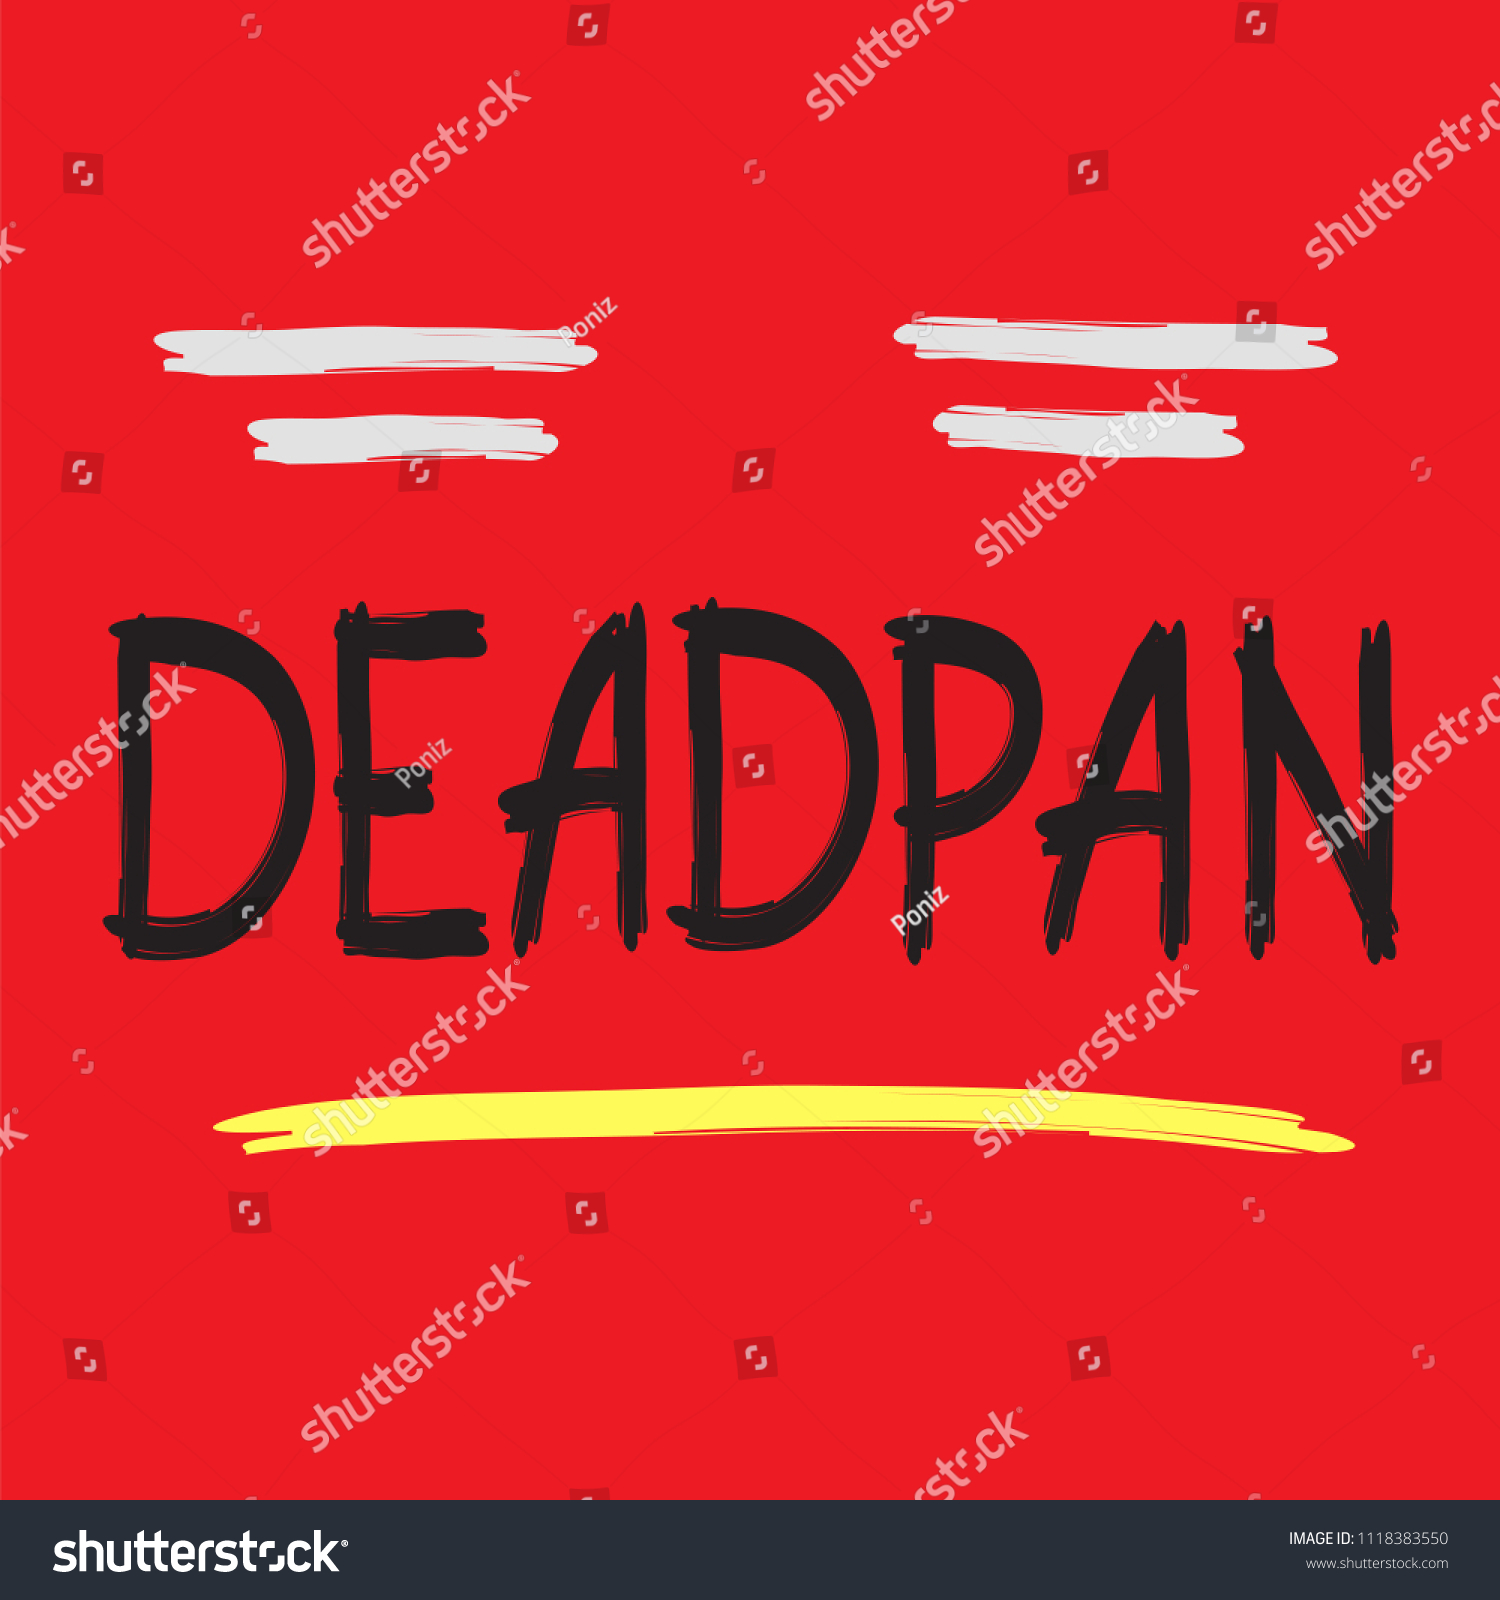 Deadpan Handwritten Quote American Slang Urban Stock Vector Royalty